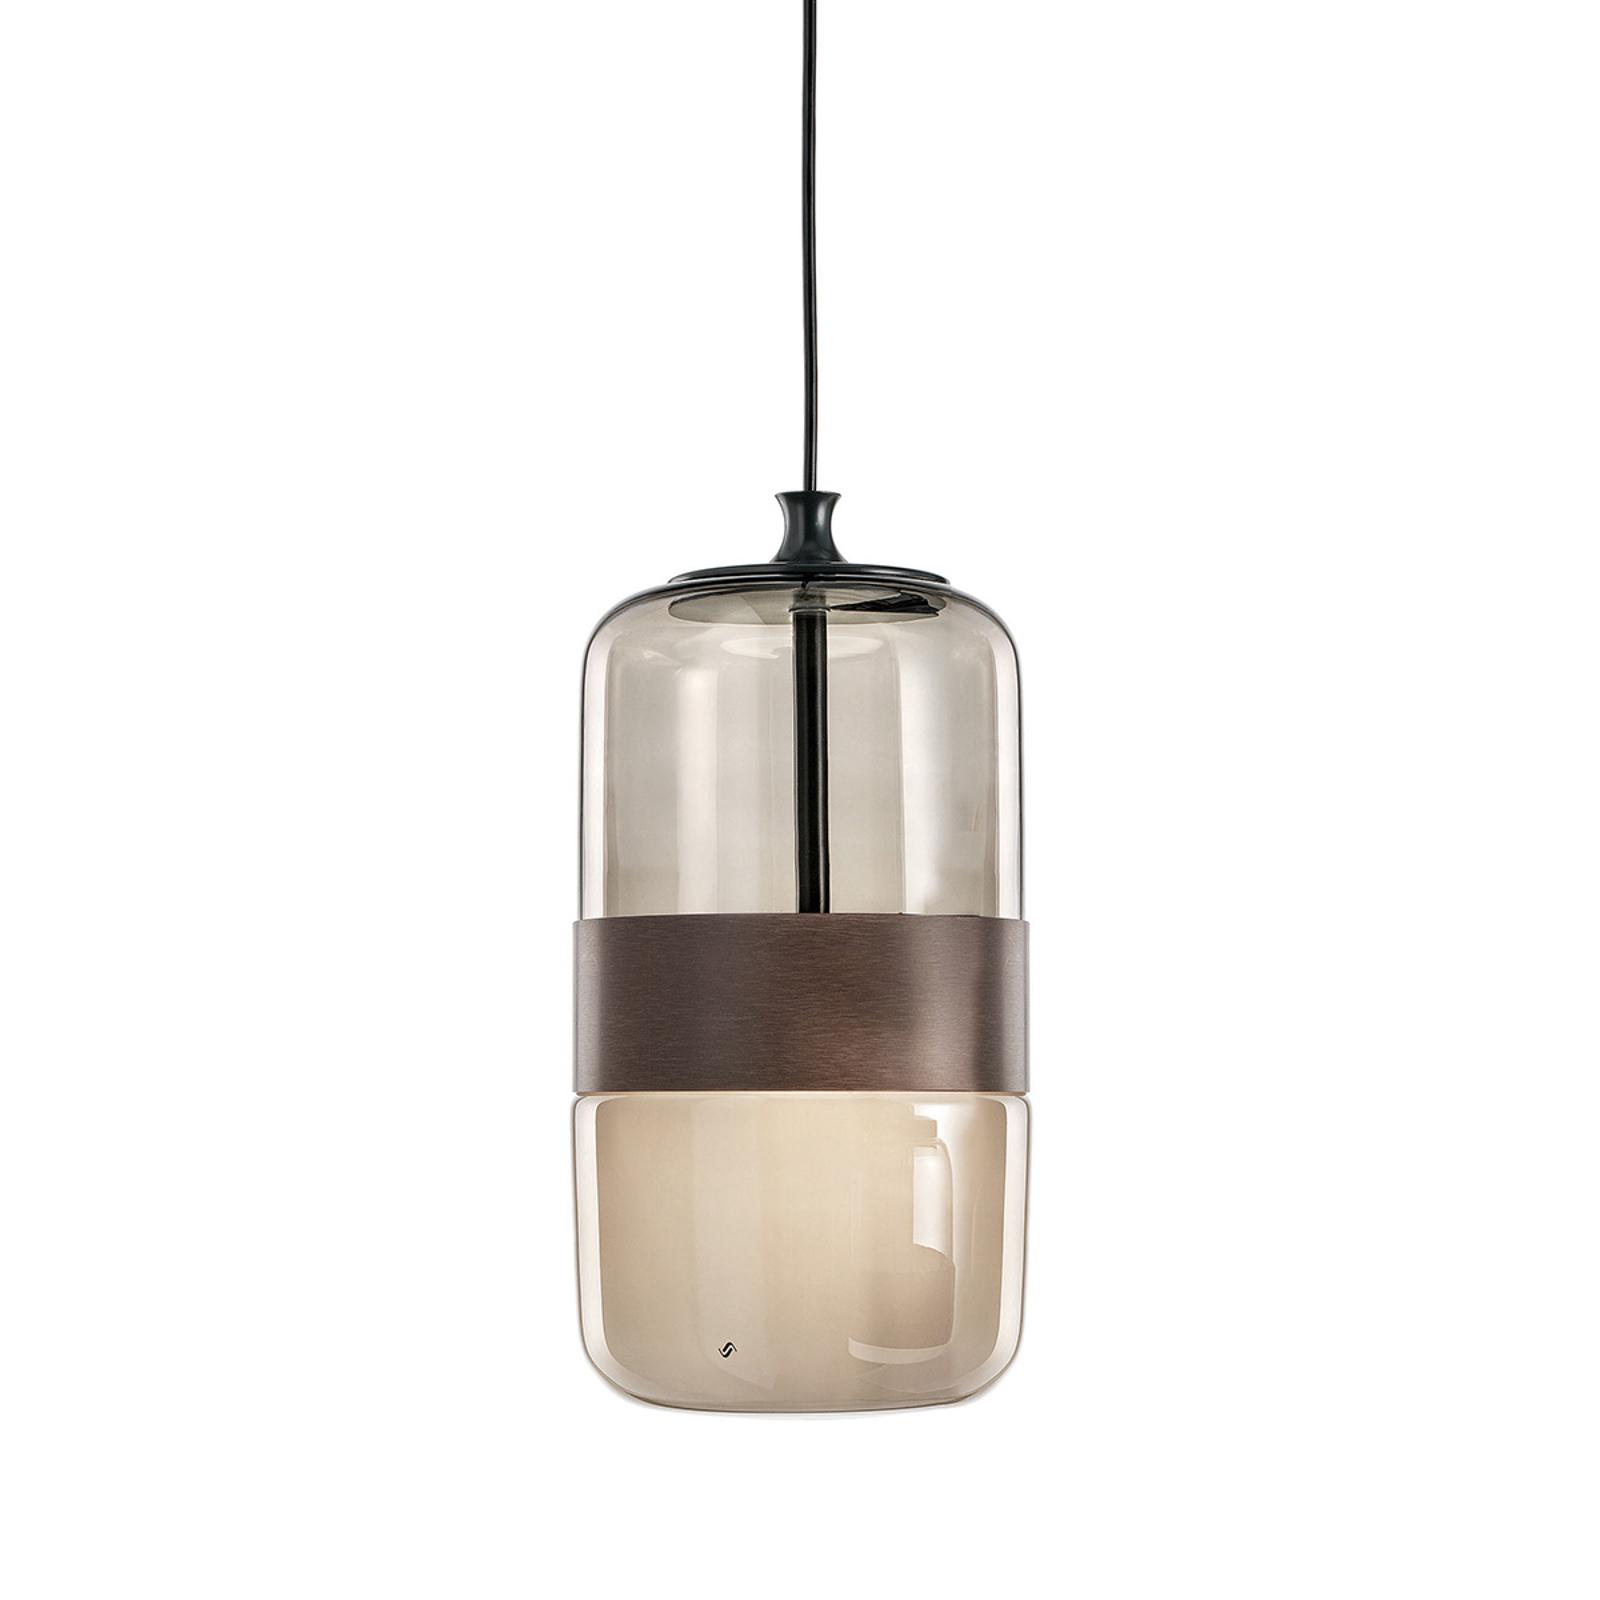 Lampa wisząca Futura ze szkła Murano, 23 cm